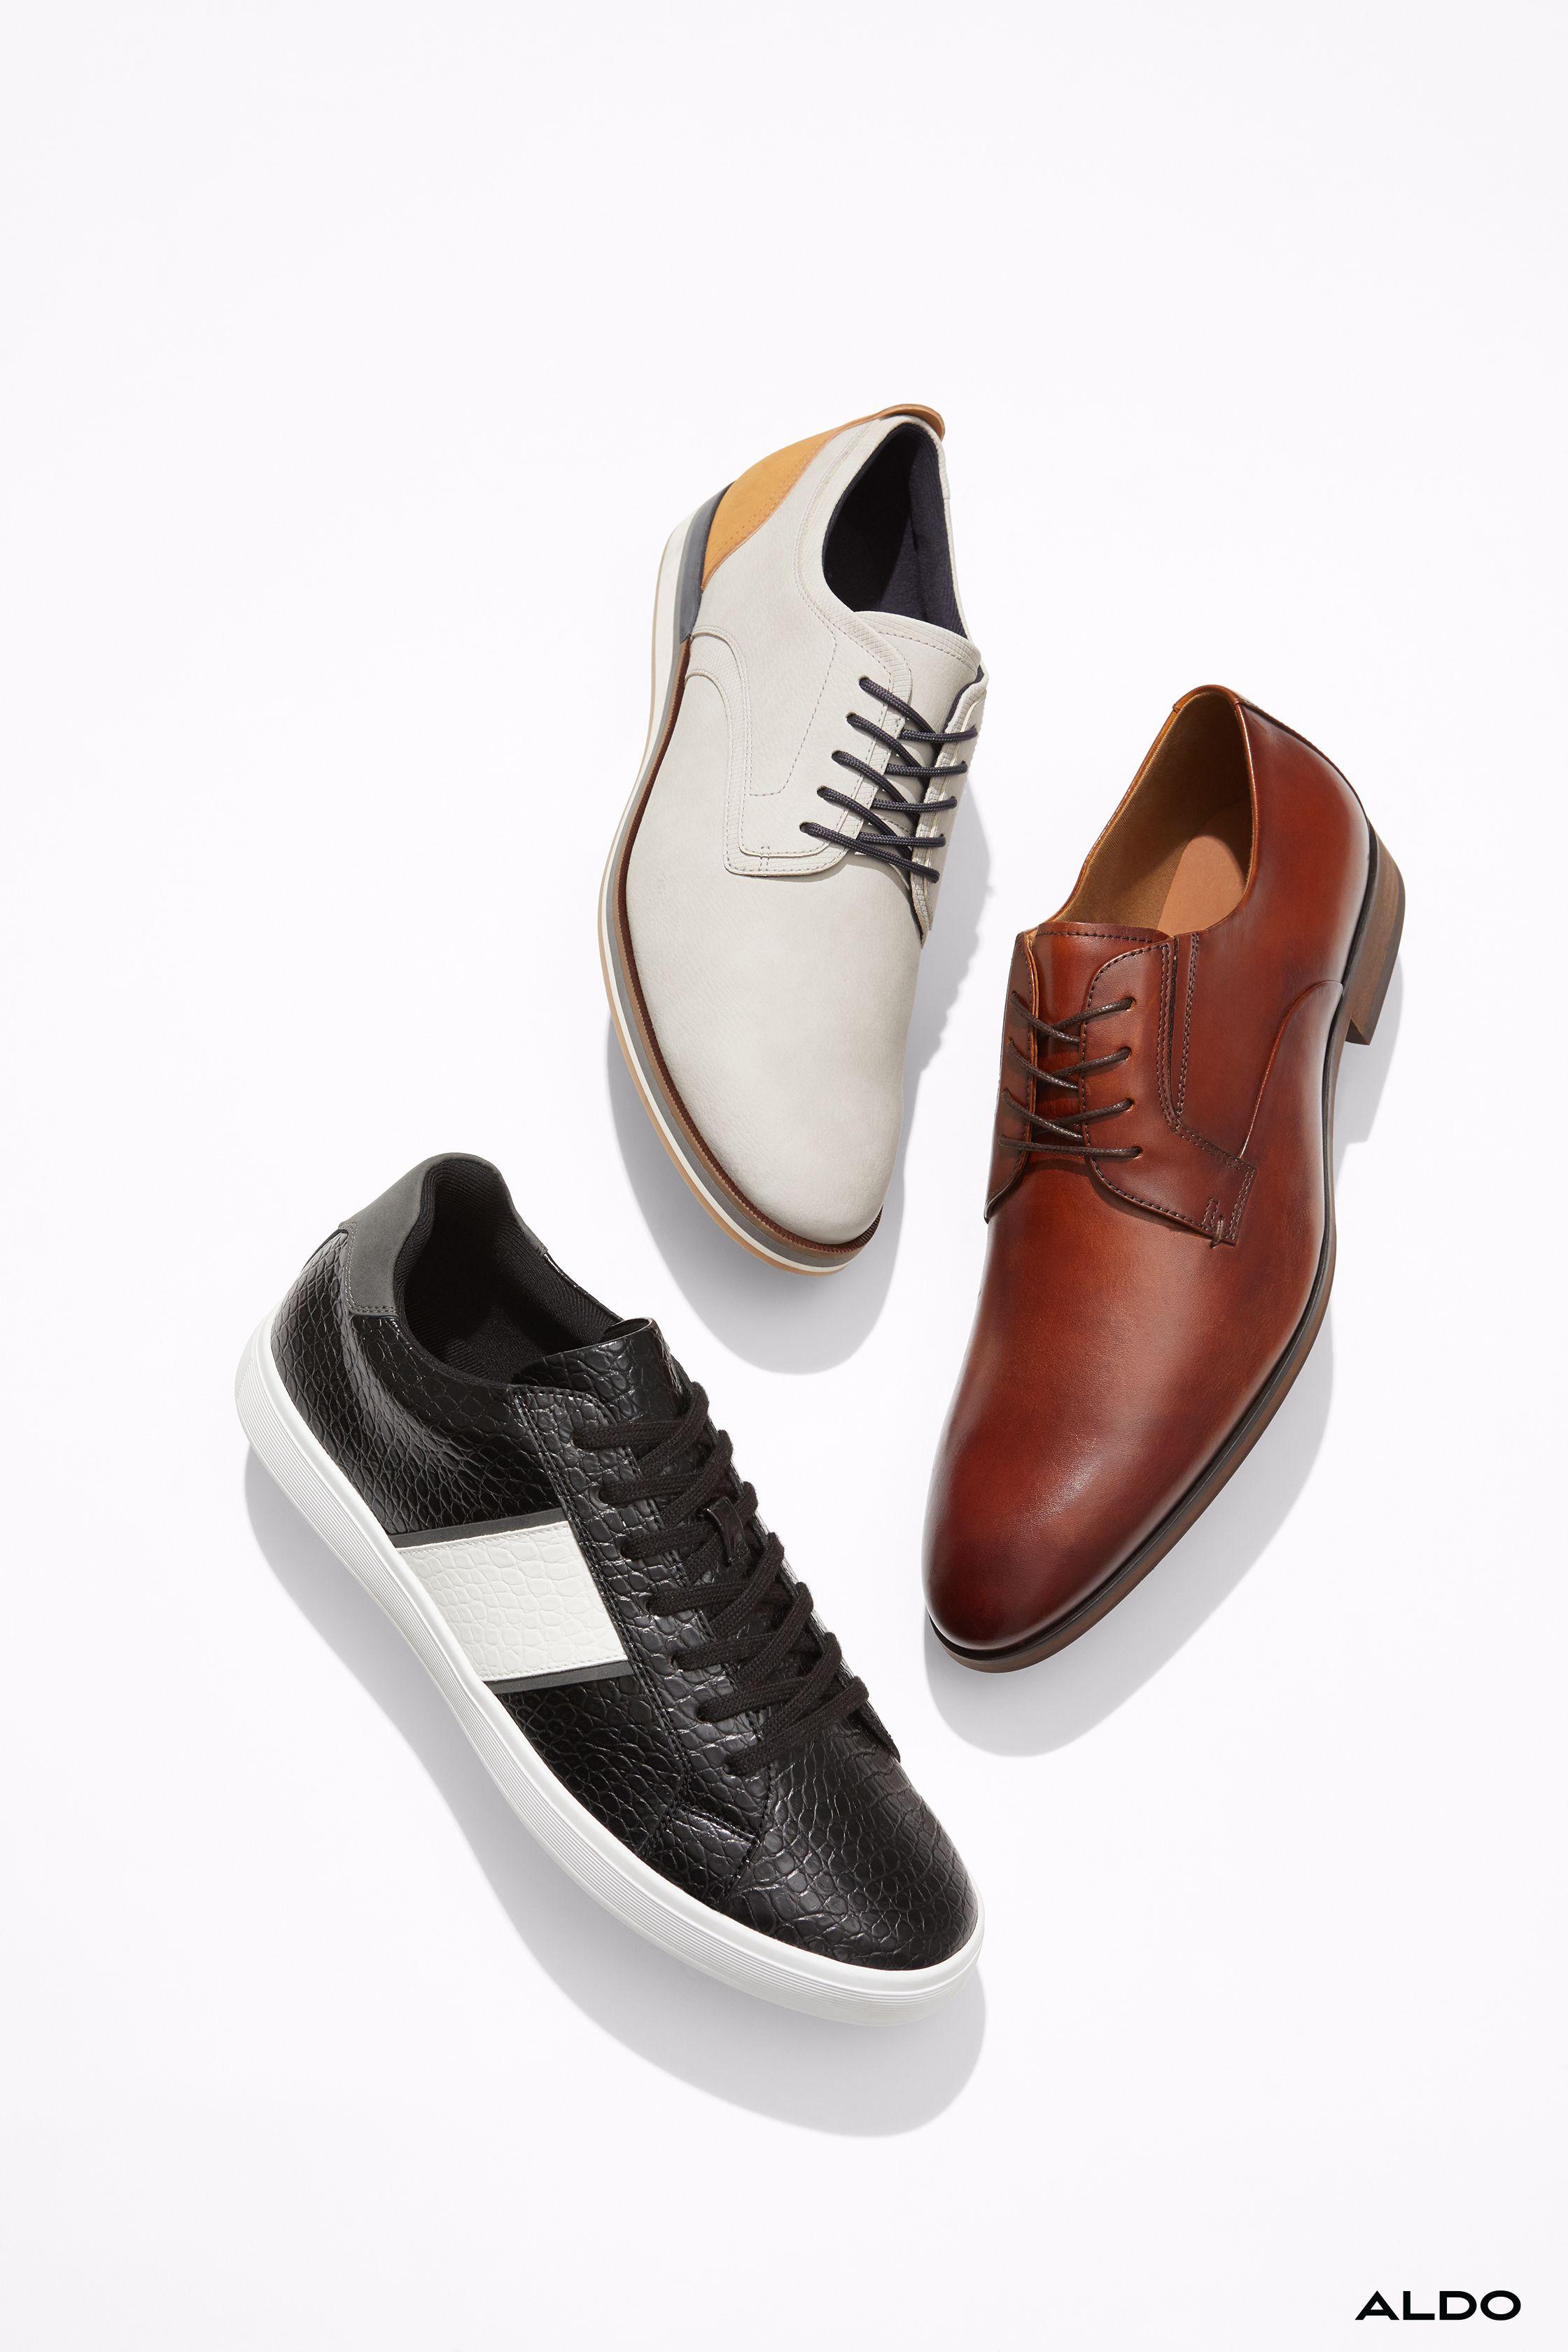 Shop new arrivals for men at Aldo Shoes